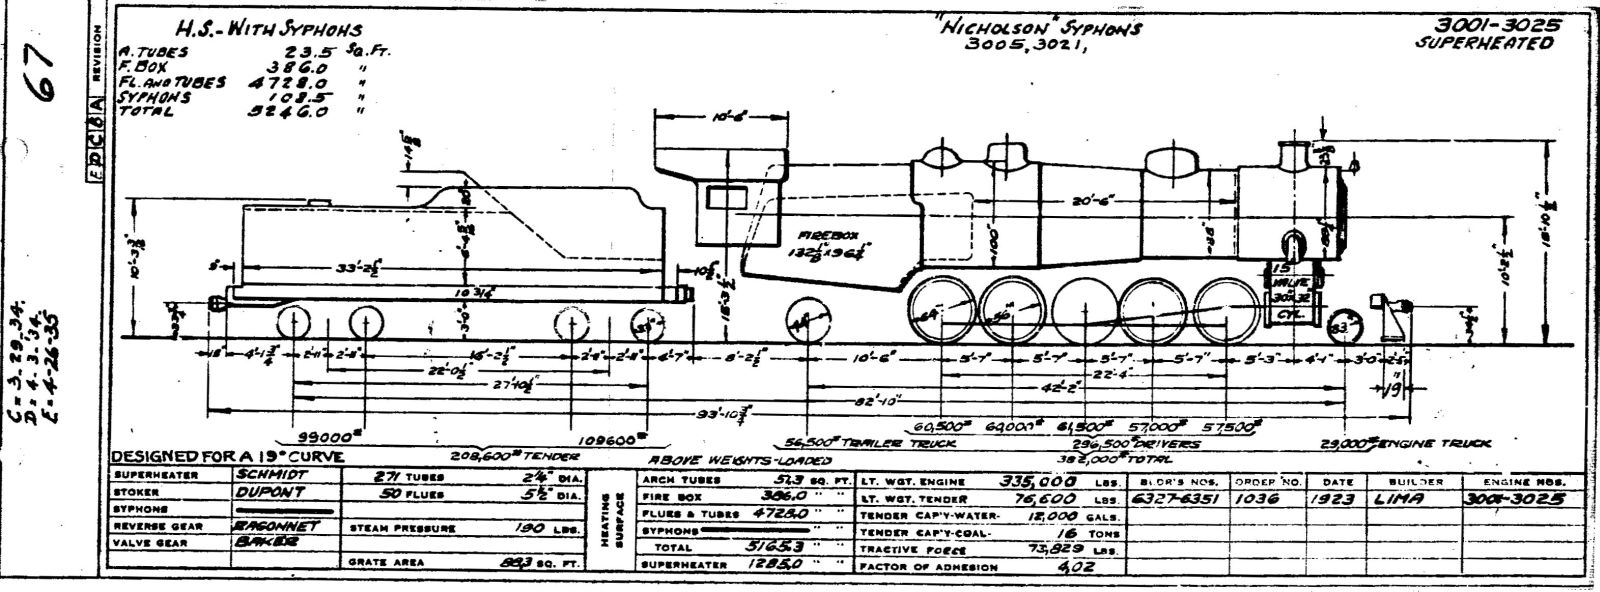 50 - locomotive 3331 51 - locomotives 3330,3334 52 - locomotives 3333 53 -  locomotives 3332 54 - locomotives 3335, 3336 55 - locomotive 3320